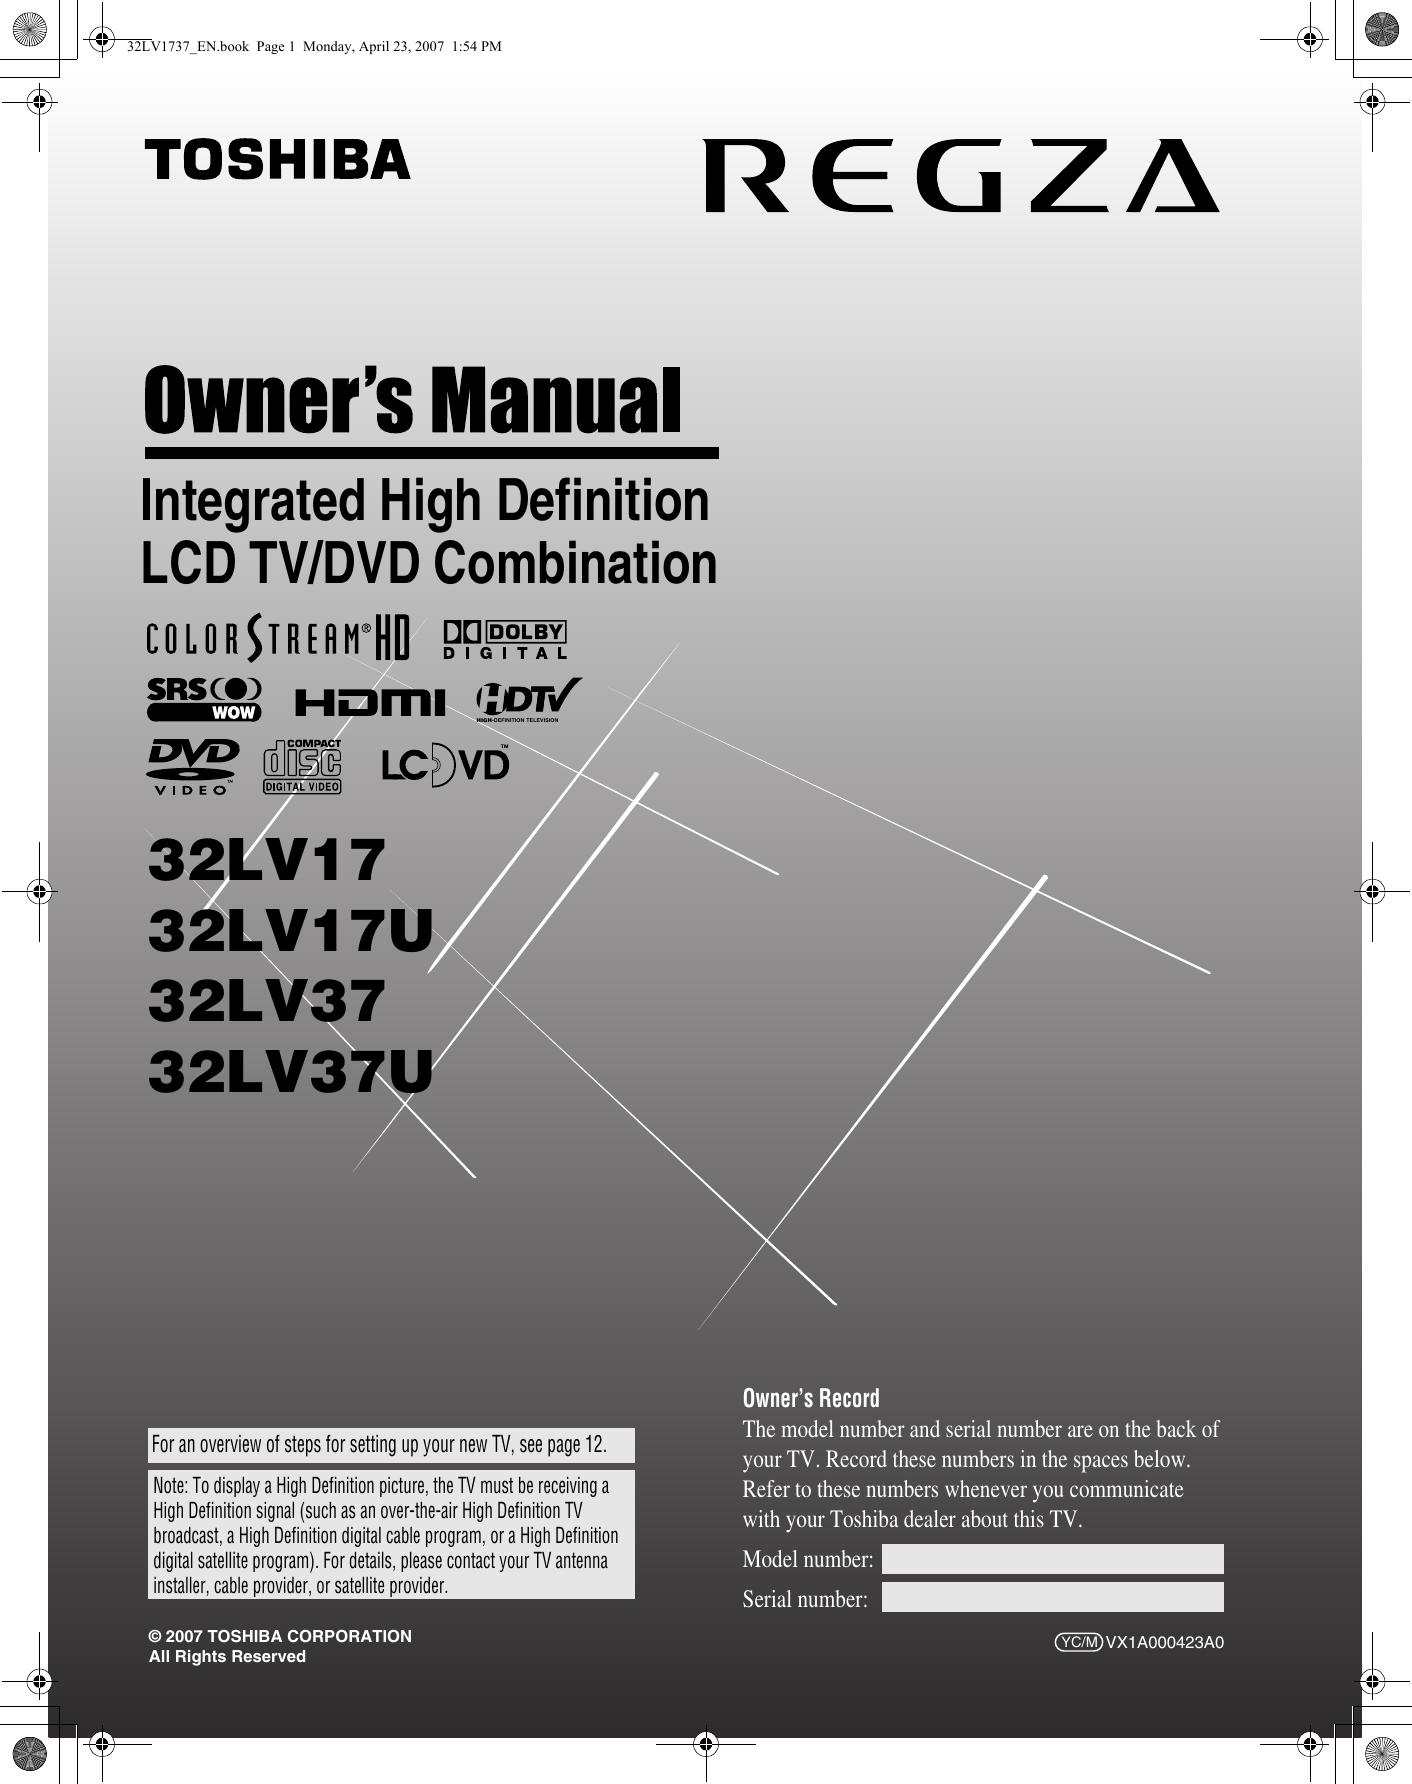 toshiba 32lv17 owners manual  at Yamaha Yz9 Wiring Diagram